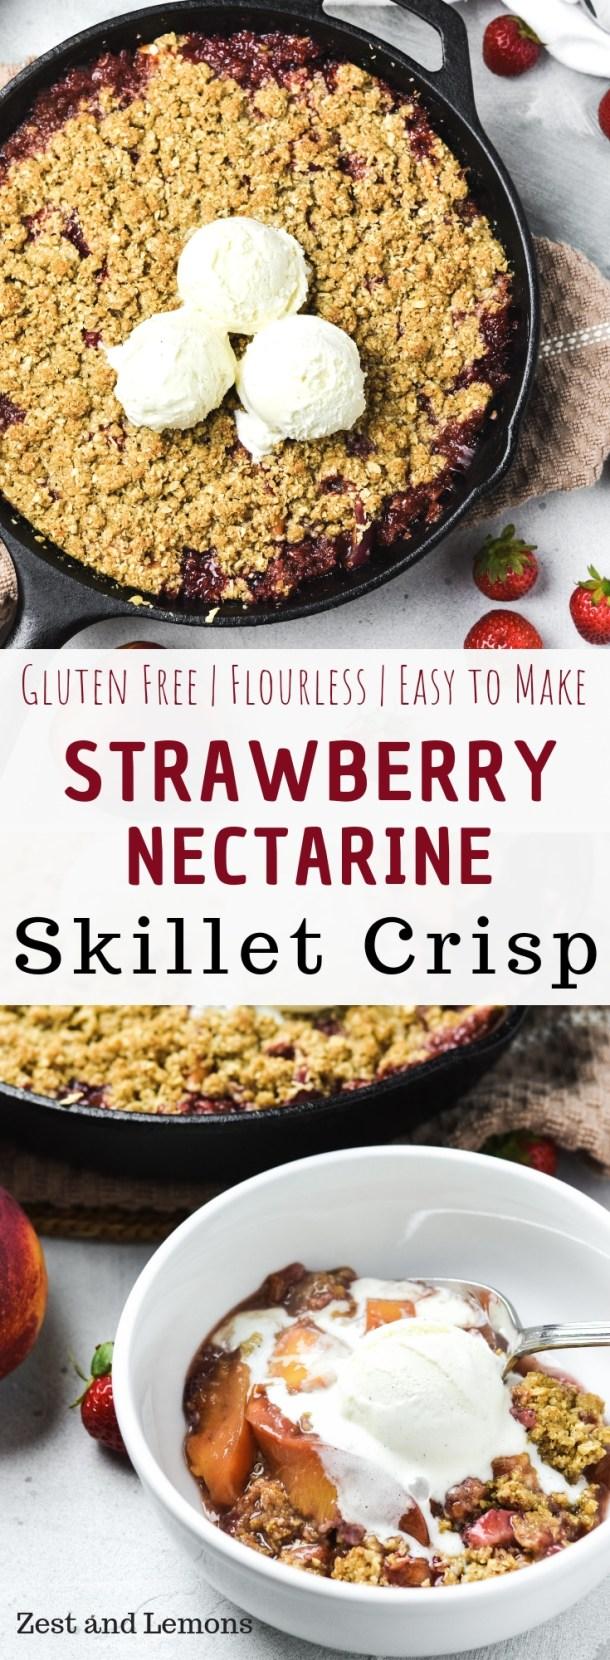 Strawberry nectarine skillet crisp, gluten free and easy to make - Zest and Lemons